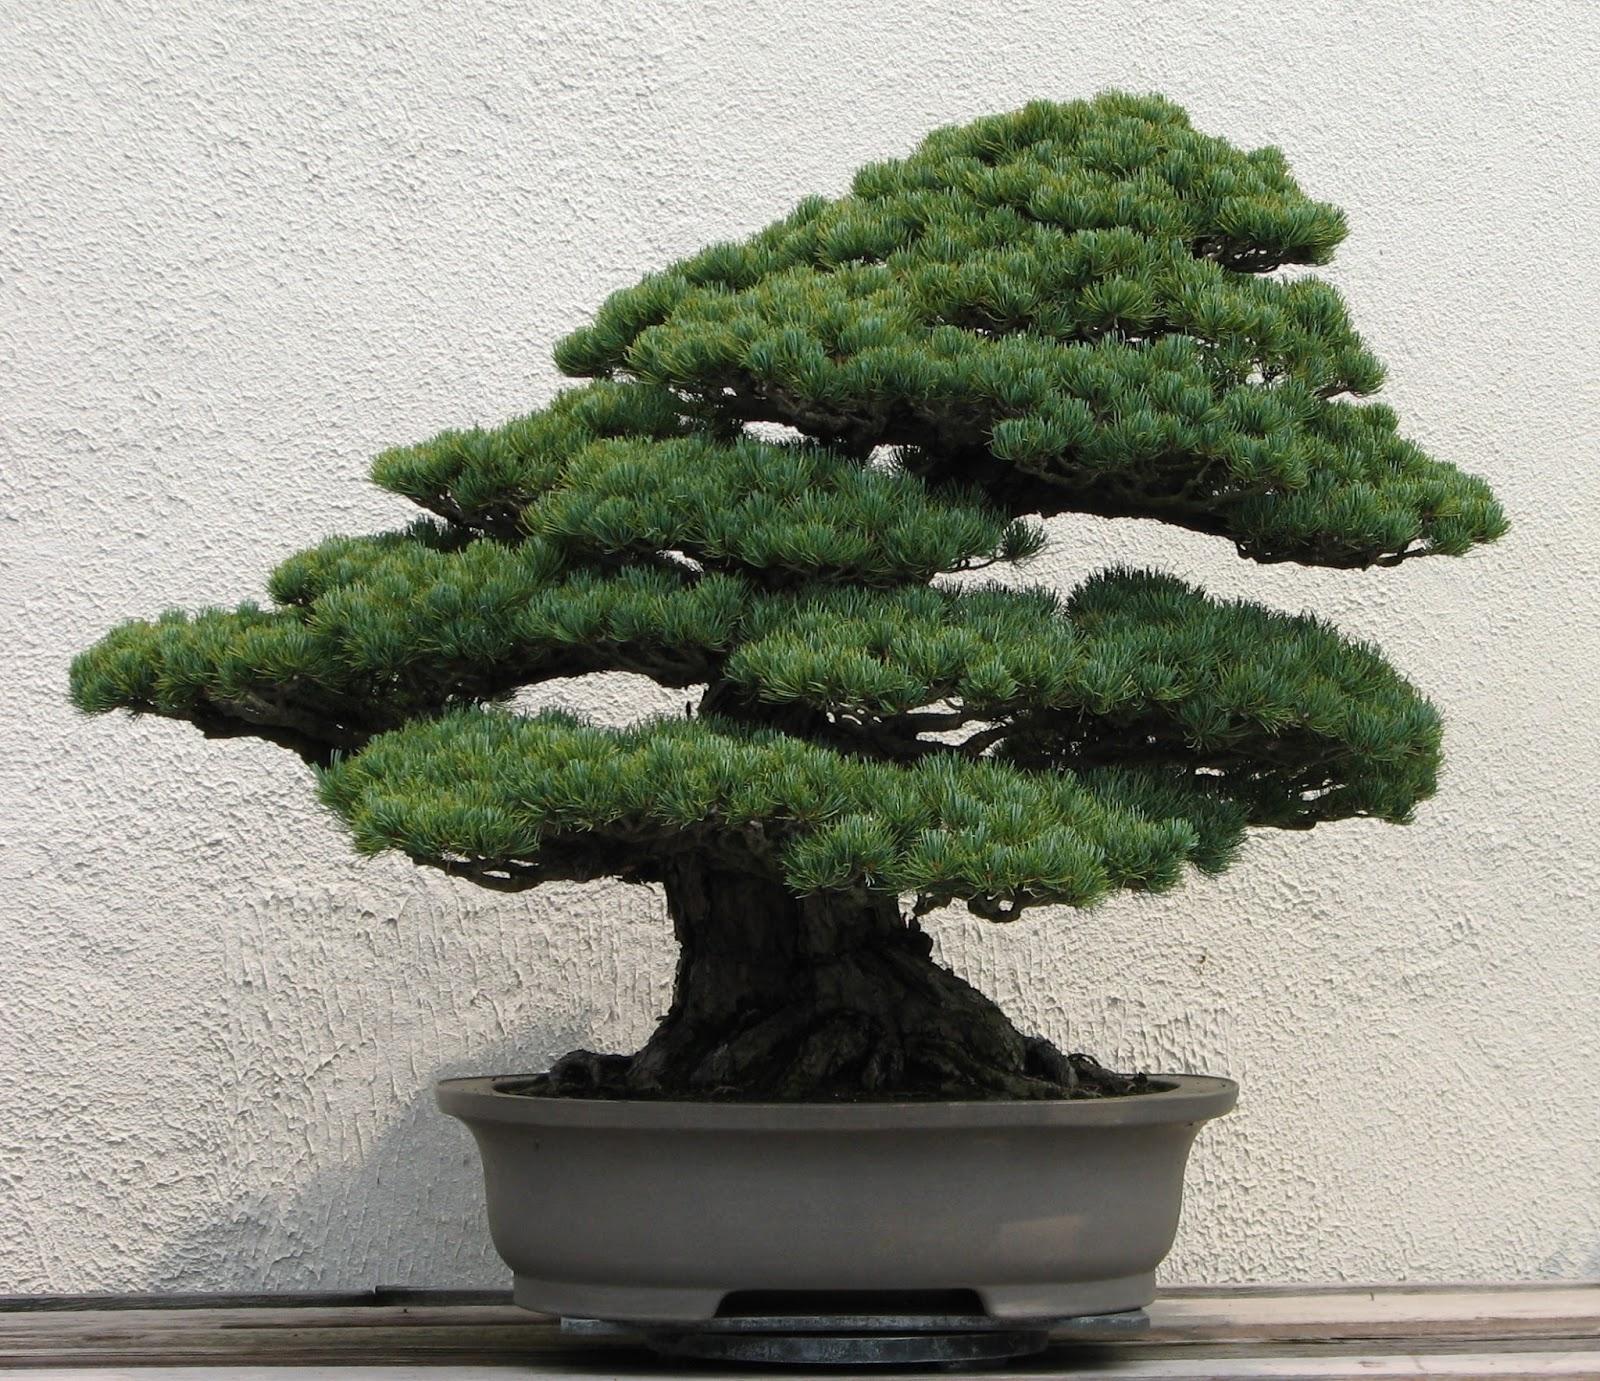 Bonsai Tree 22 Excellent Bonsai Trees Ideas